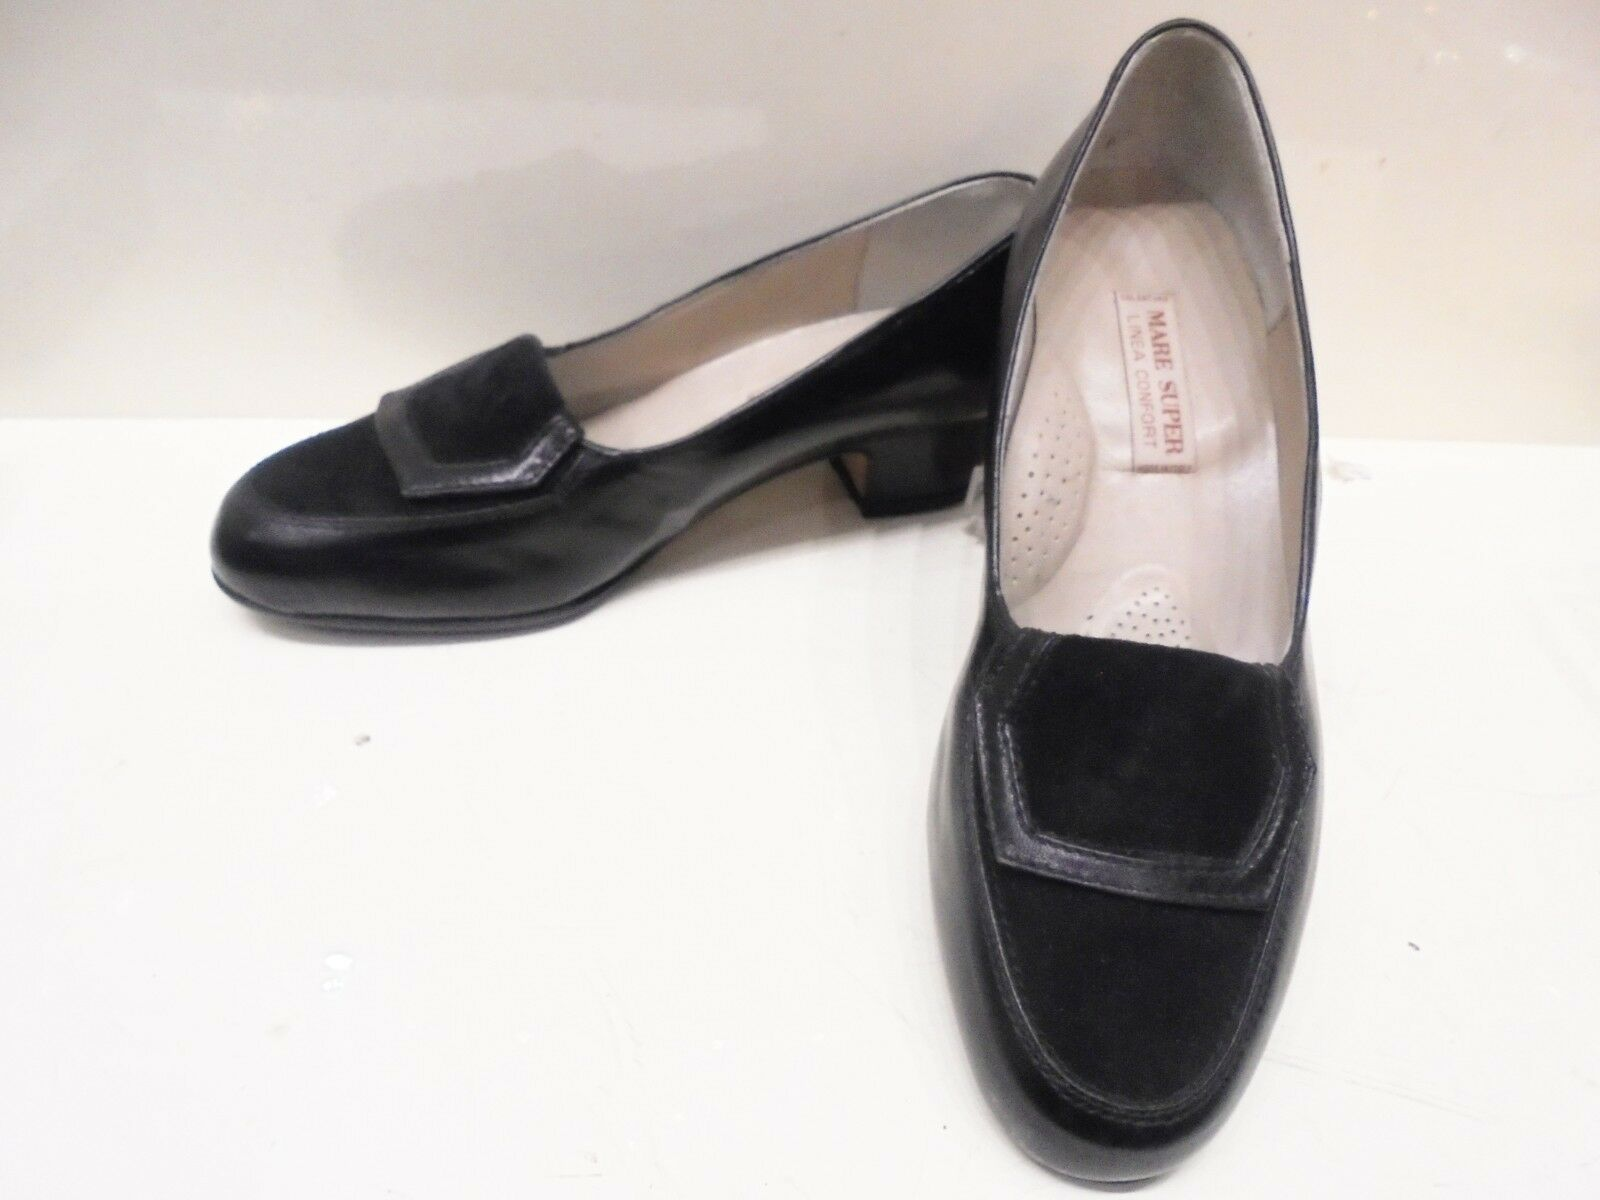 shoes MOCASSINI women IN PELLE E CAMOSCIO black MADE ITALY ARTIGIANALI N.37